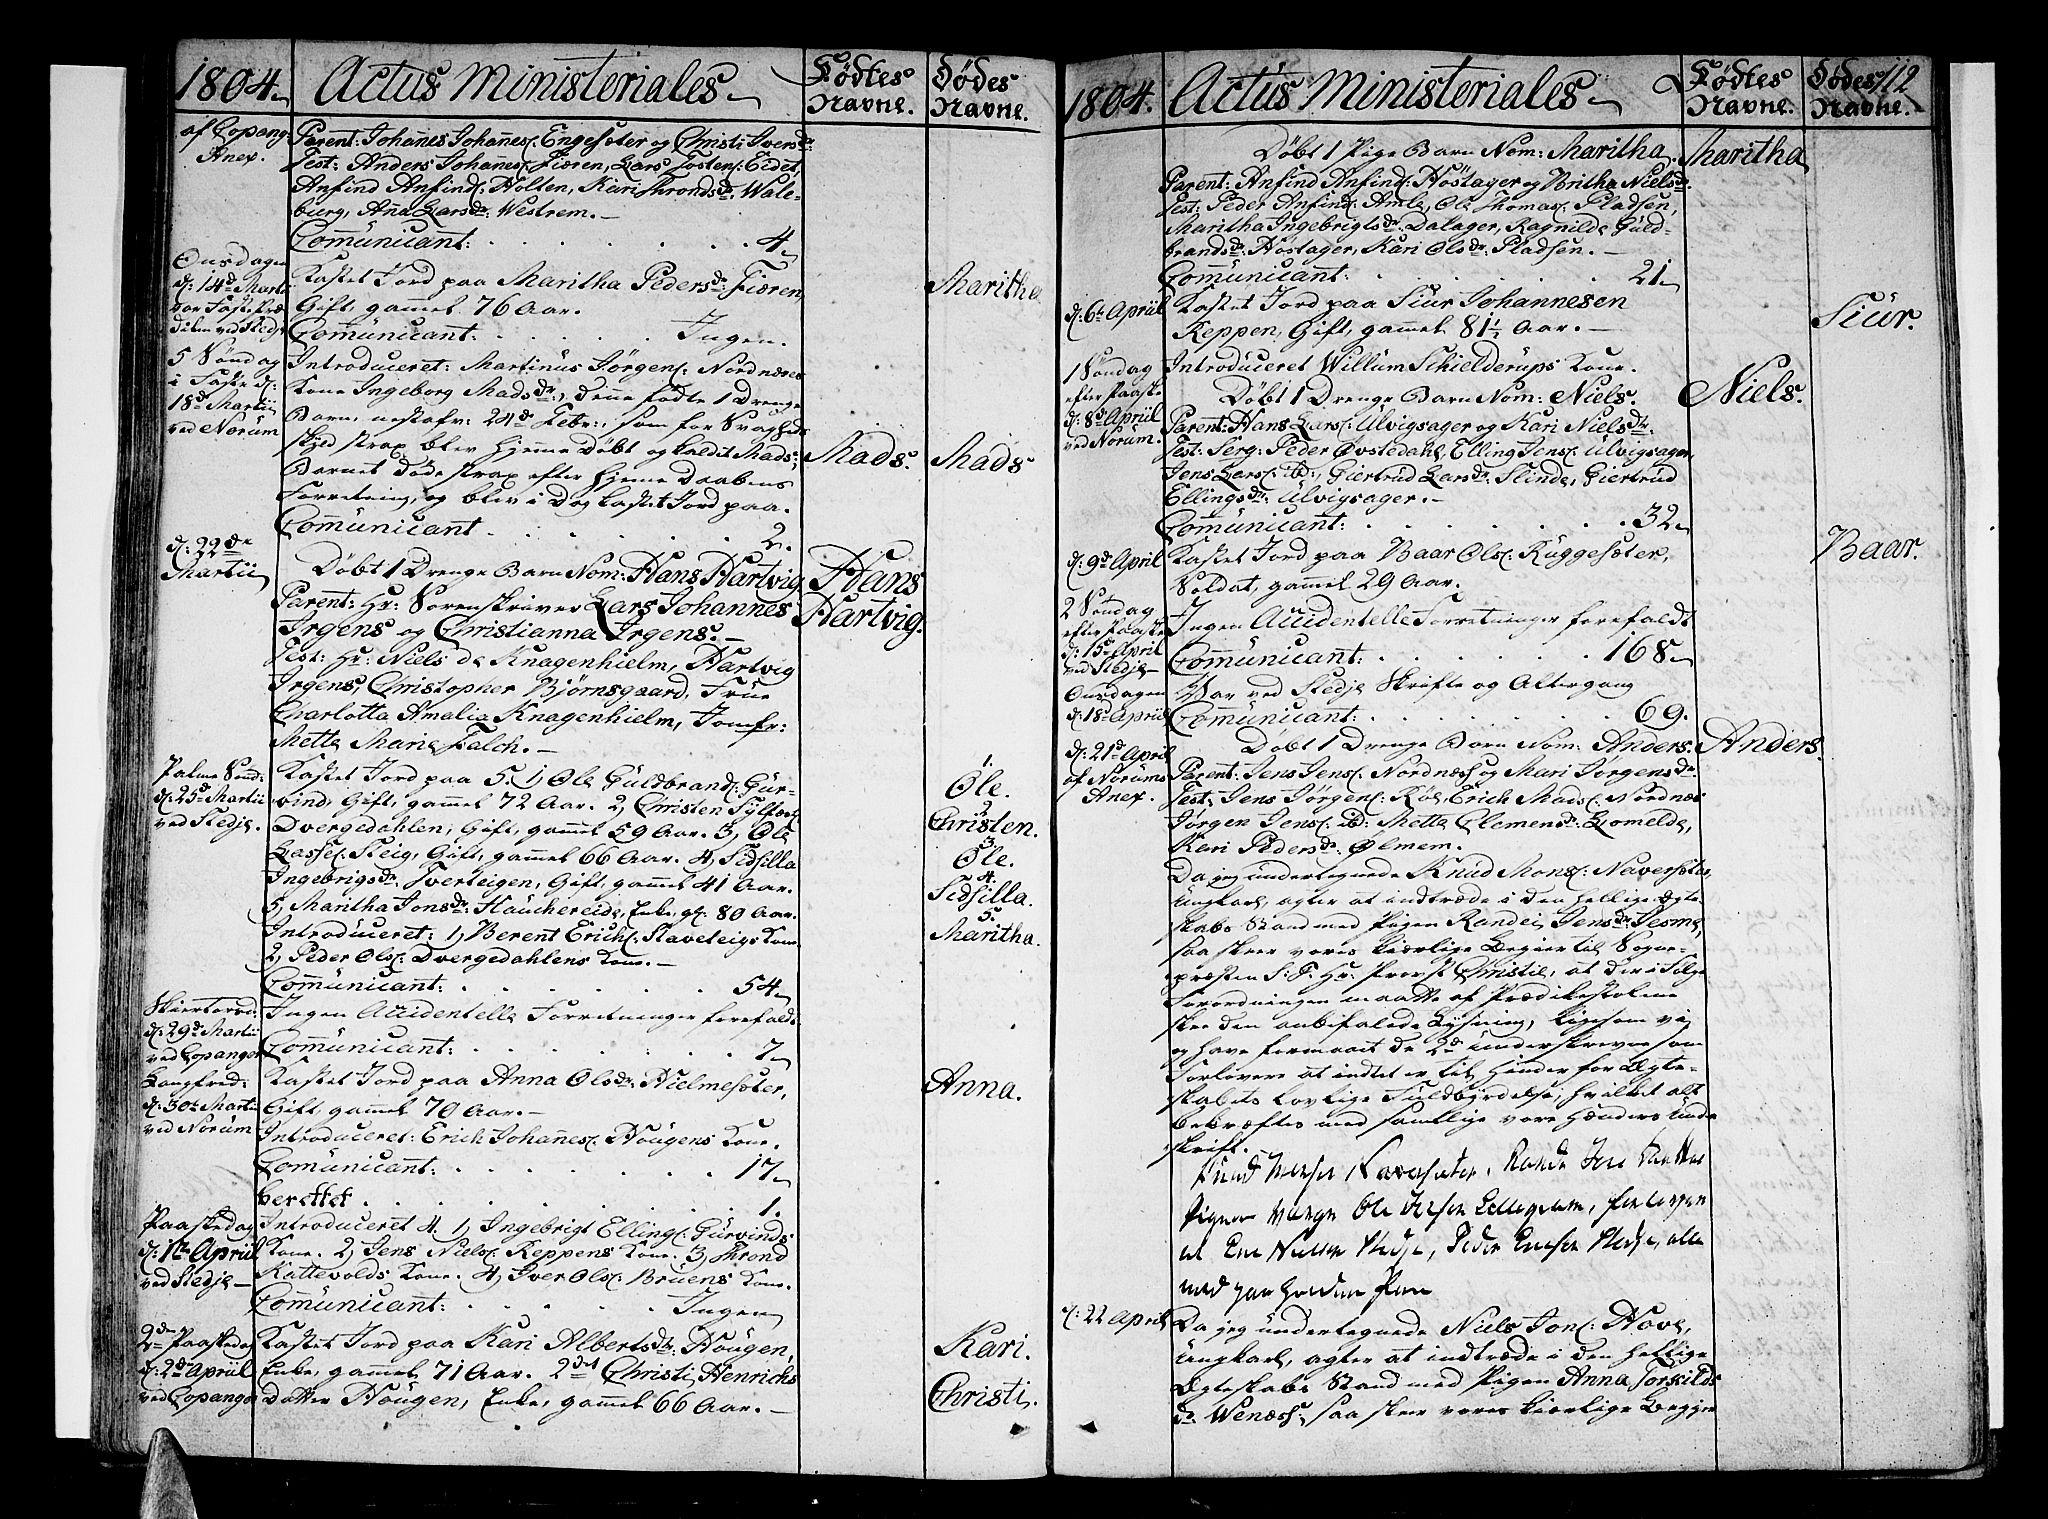 SAB, Sogndal sokneprestembete, H/Haa/Haaa/L0008: Ministerialbok nr. A 8, 1795-1809, s. 112